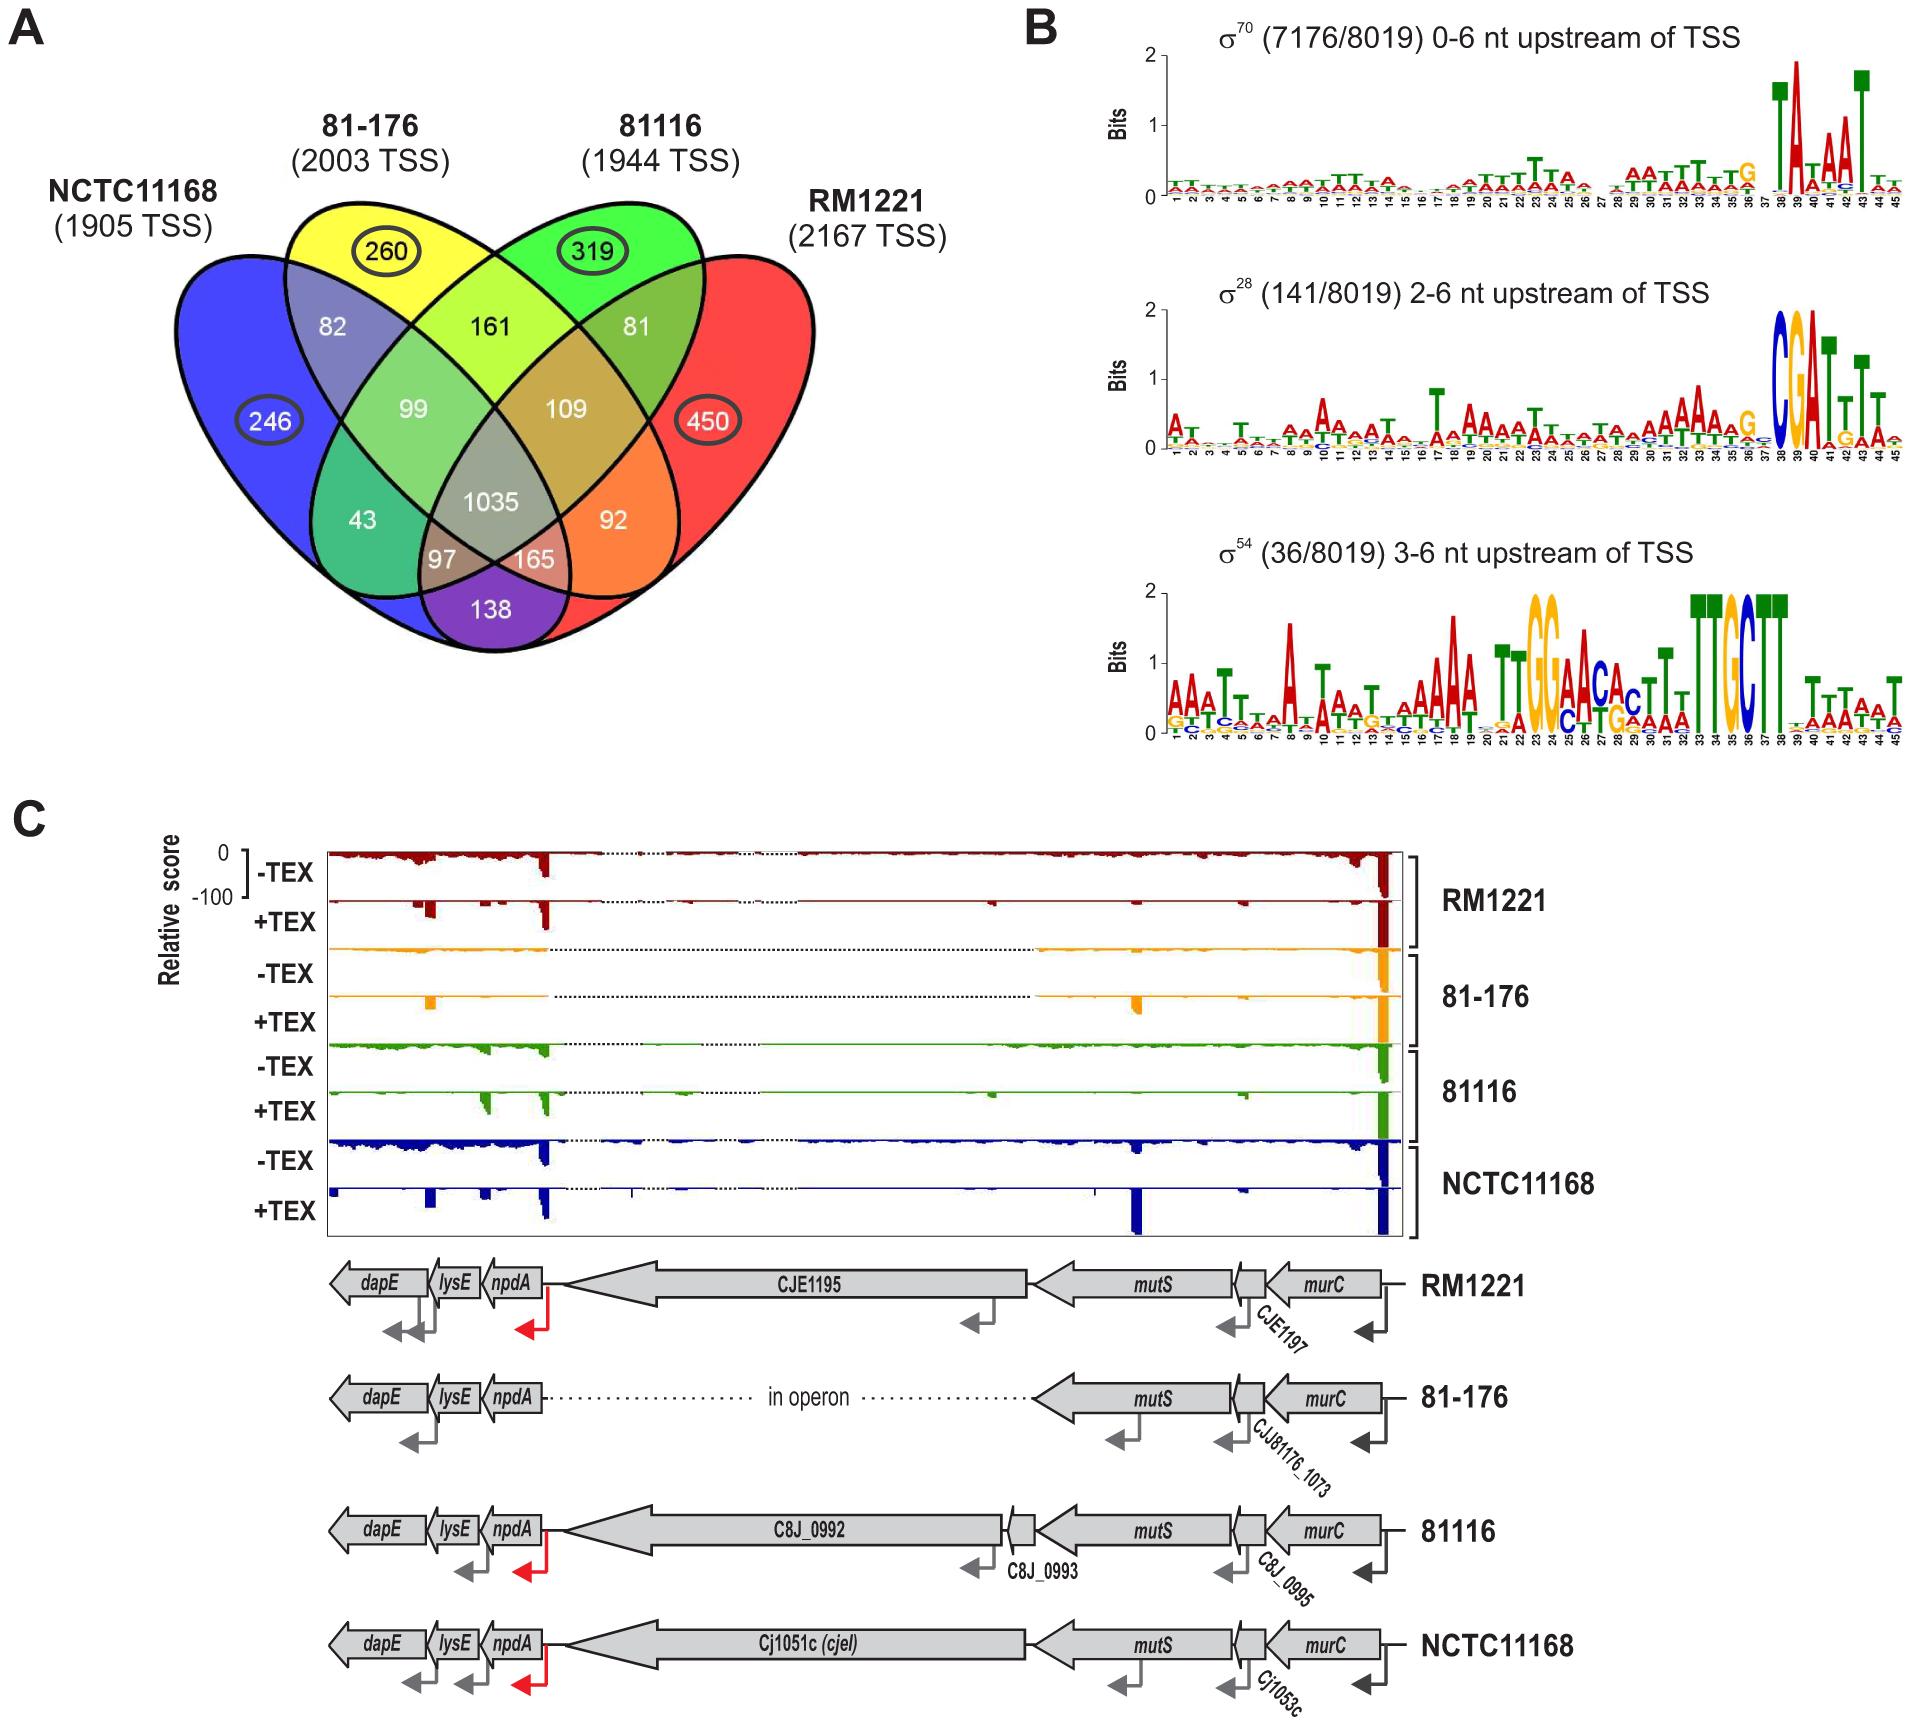 Transcriptome features of multiple <i>C. jejuni</i> strains.